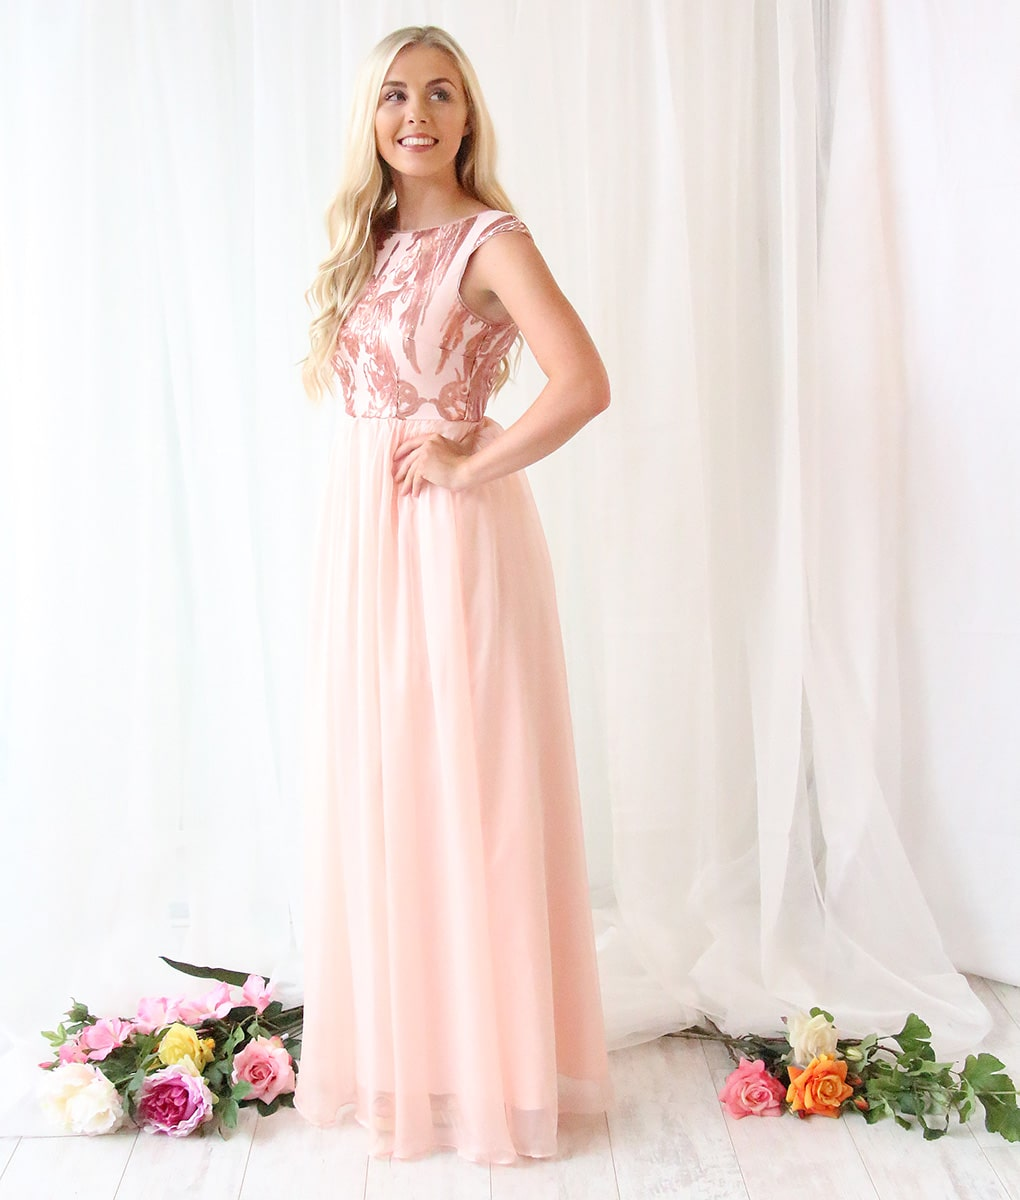 Alila-Blush-Chiffon-Debs-gown-Bariano